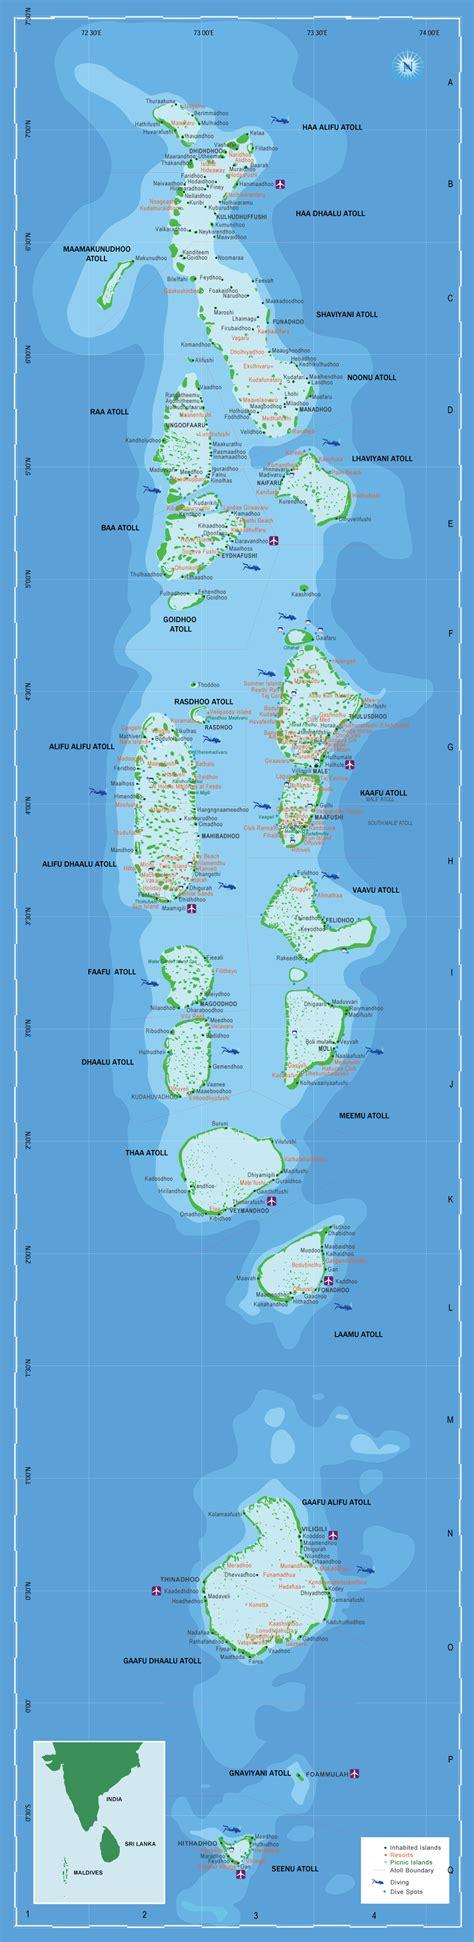 the maldives on world map maldives map and geographic location my maldives